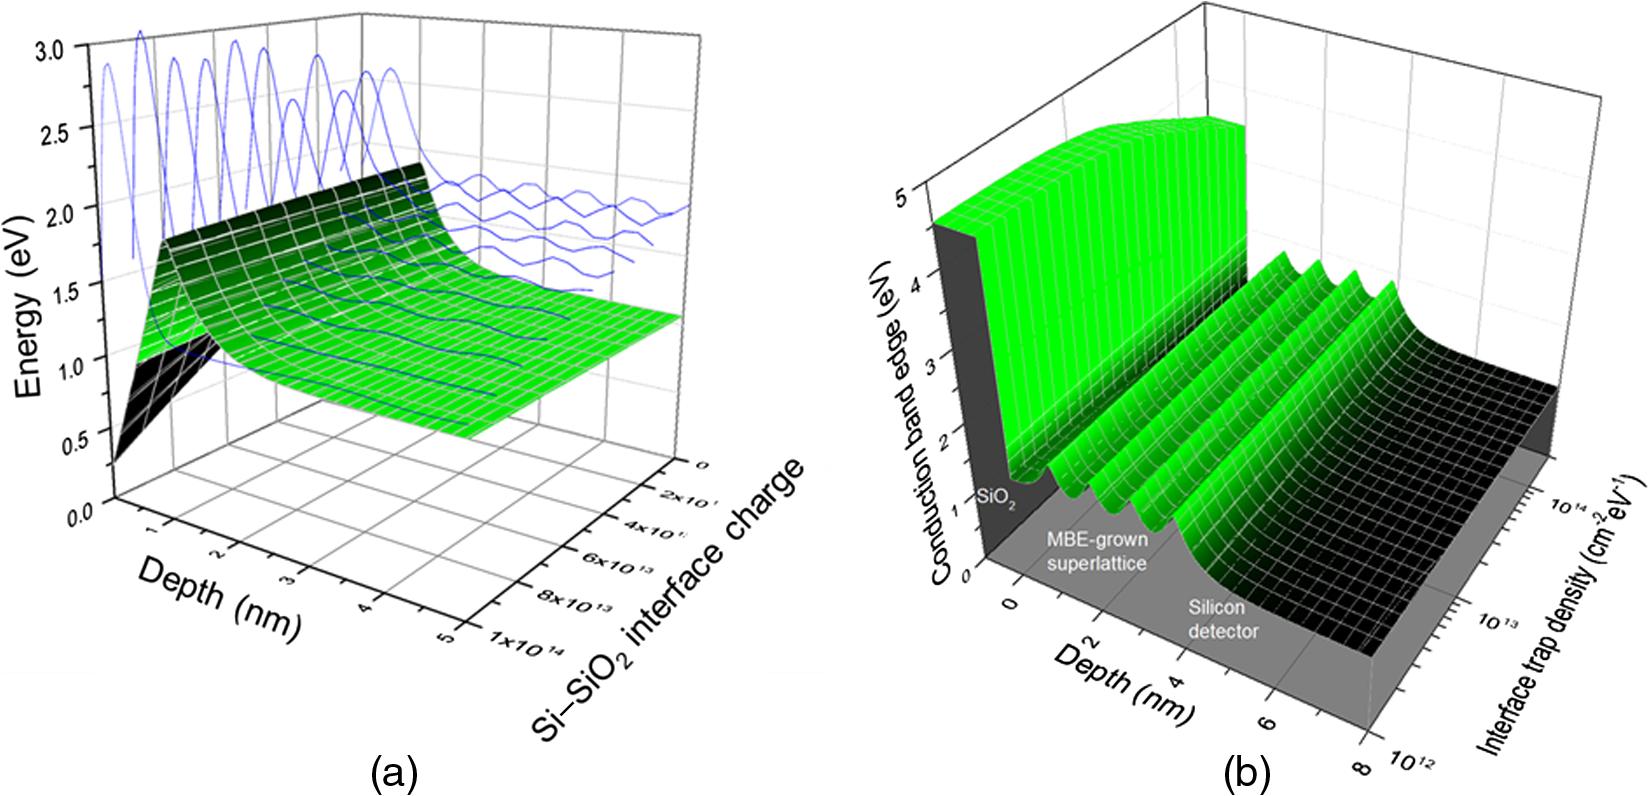 High Efficiency Uv Optical Nir Detectors For Large Aperture Geiger Counter Diagram Chapter 21 Section 5 Fig